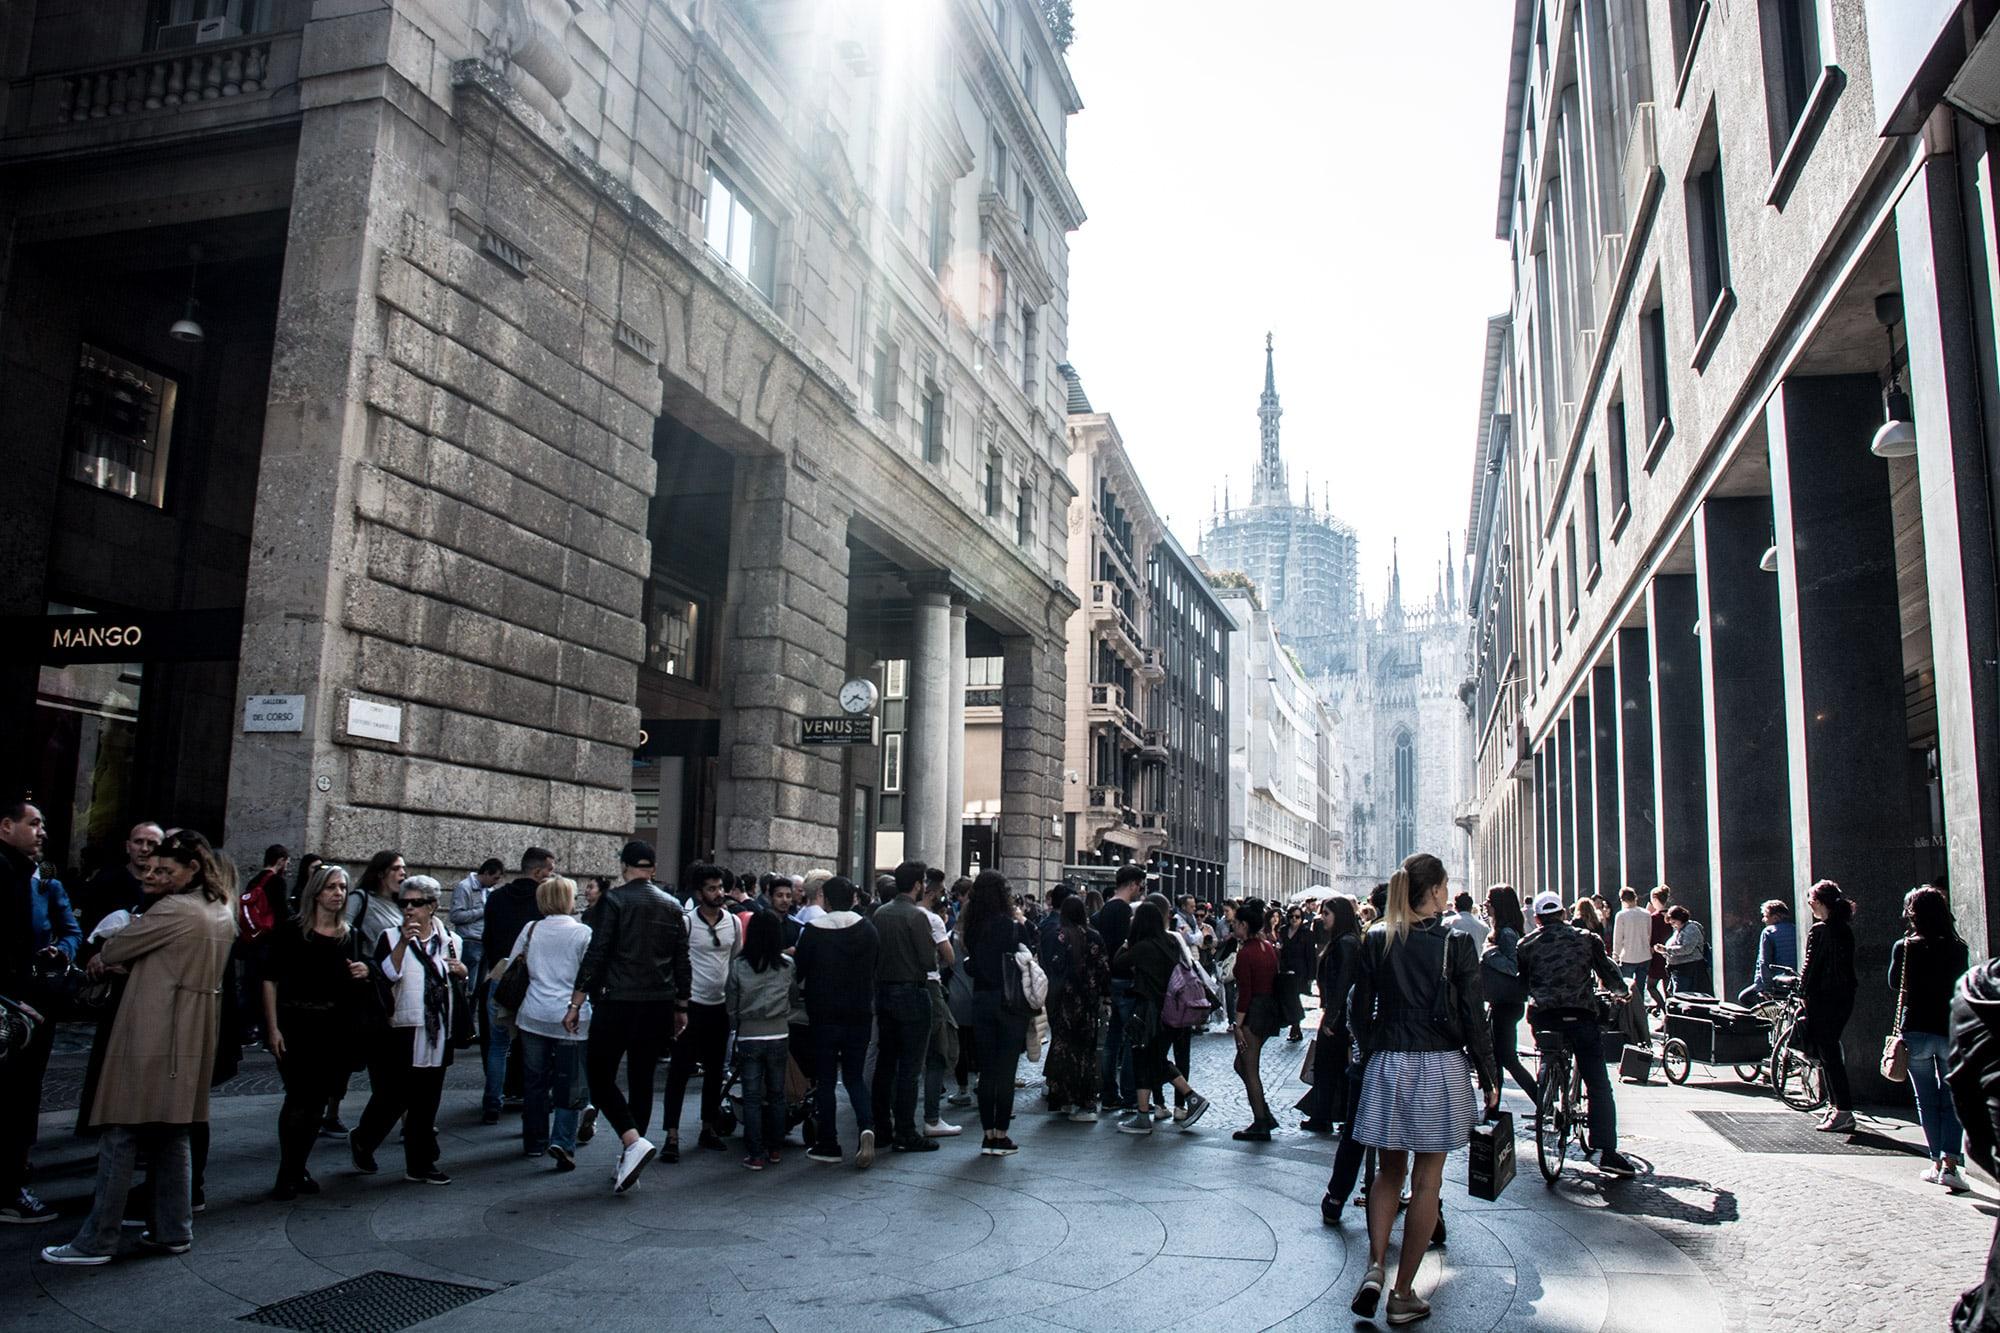 DSC 5885 min #общество Campari, wizzair, Брера, бутик, визы, Грузия, Дуомо, Италия, Кутаиси, Ла Скала, Милан, мода, шоппинг